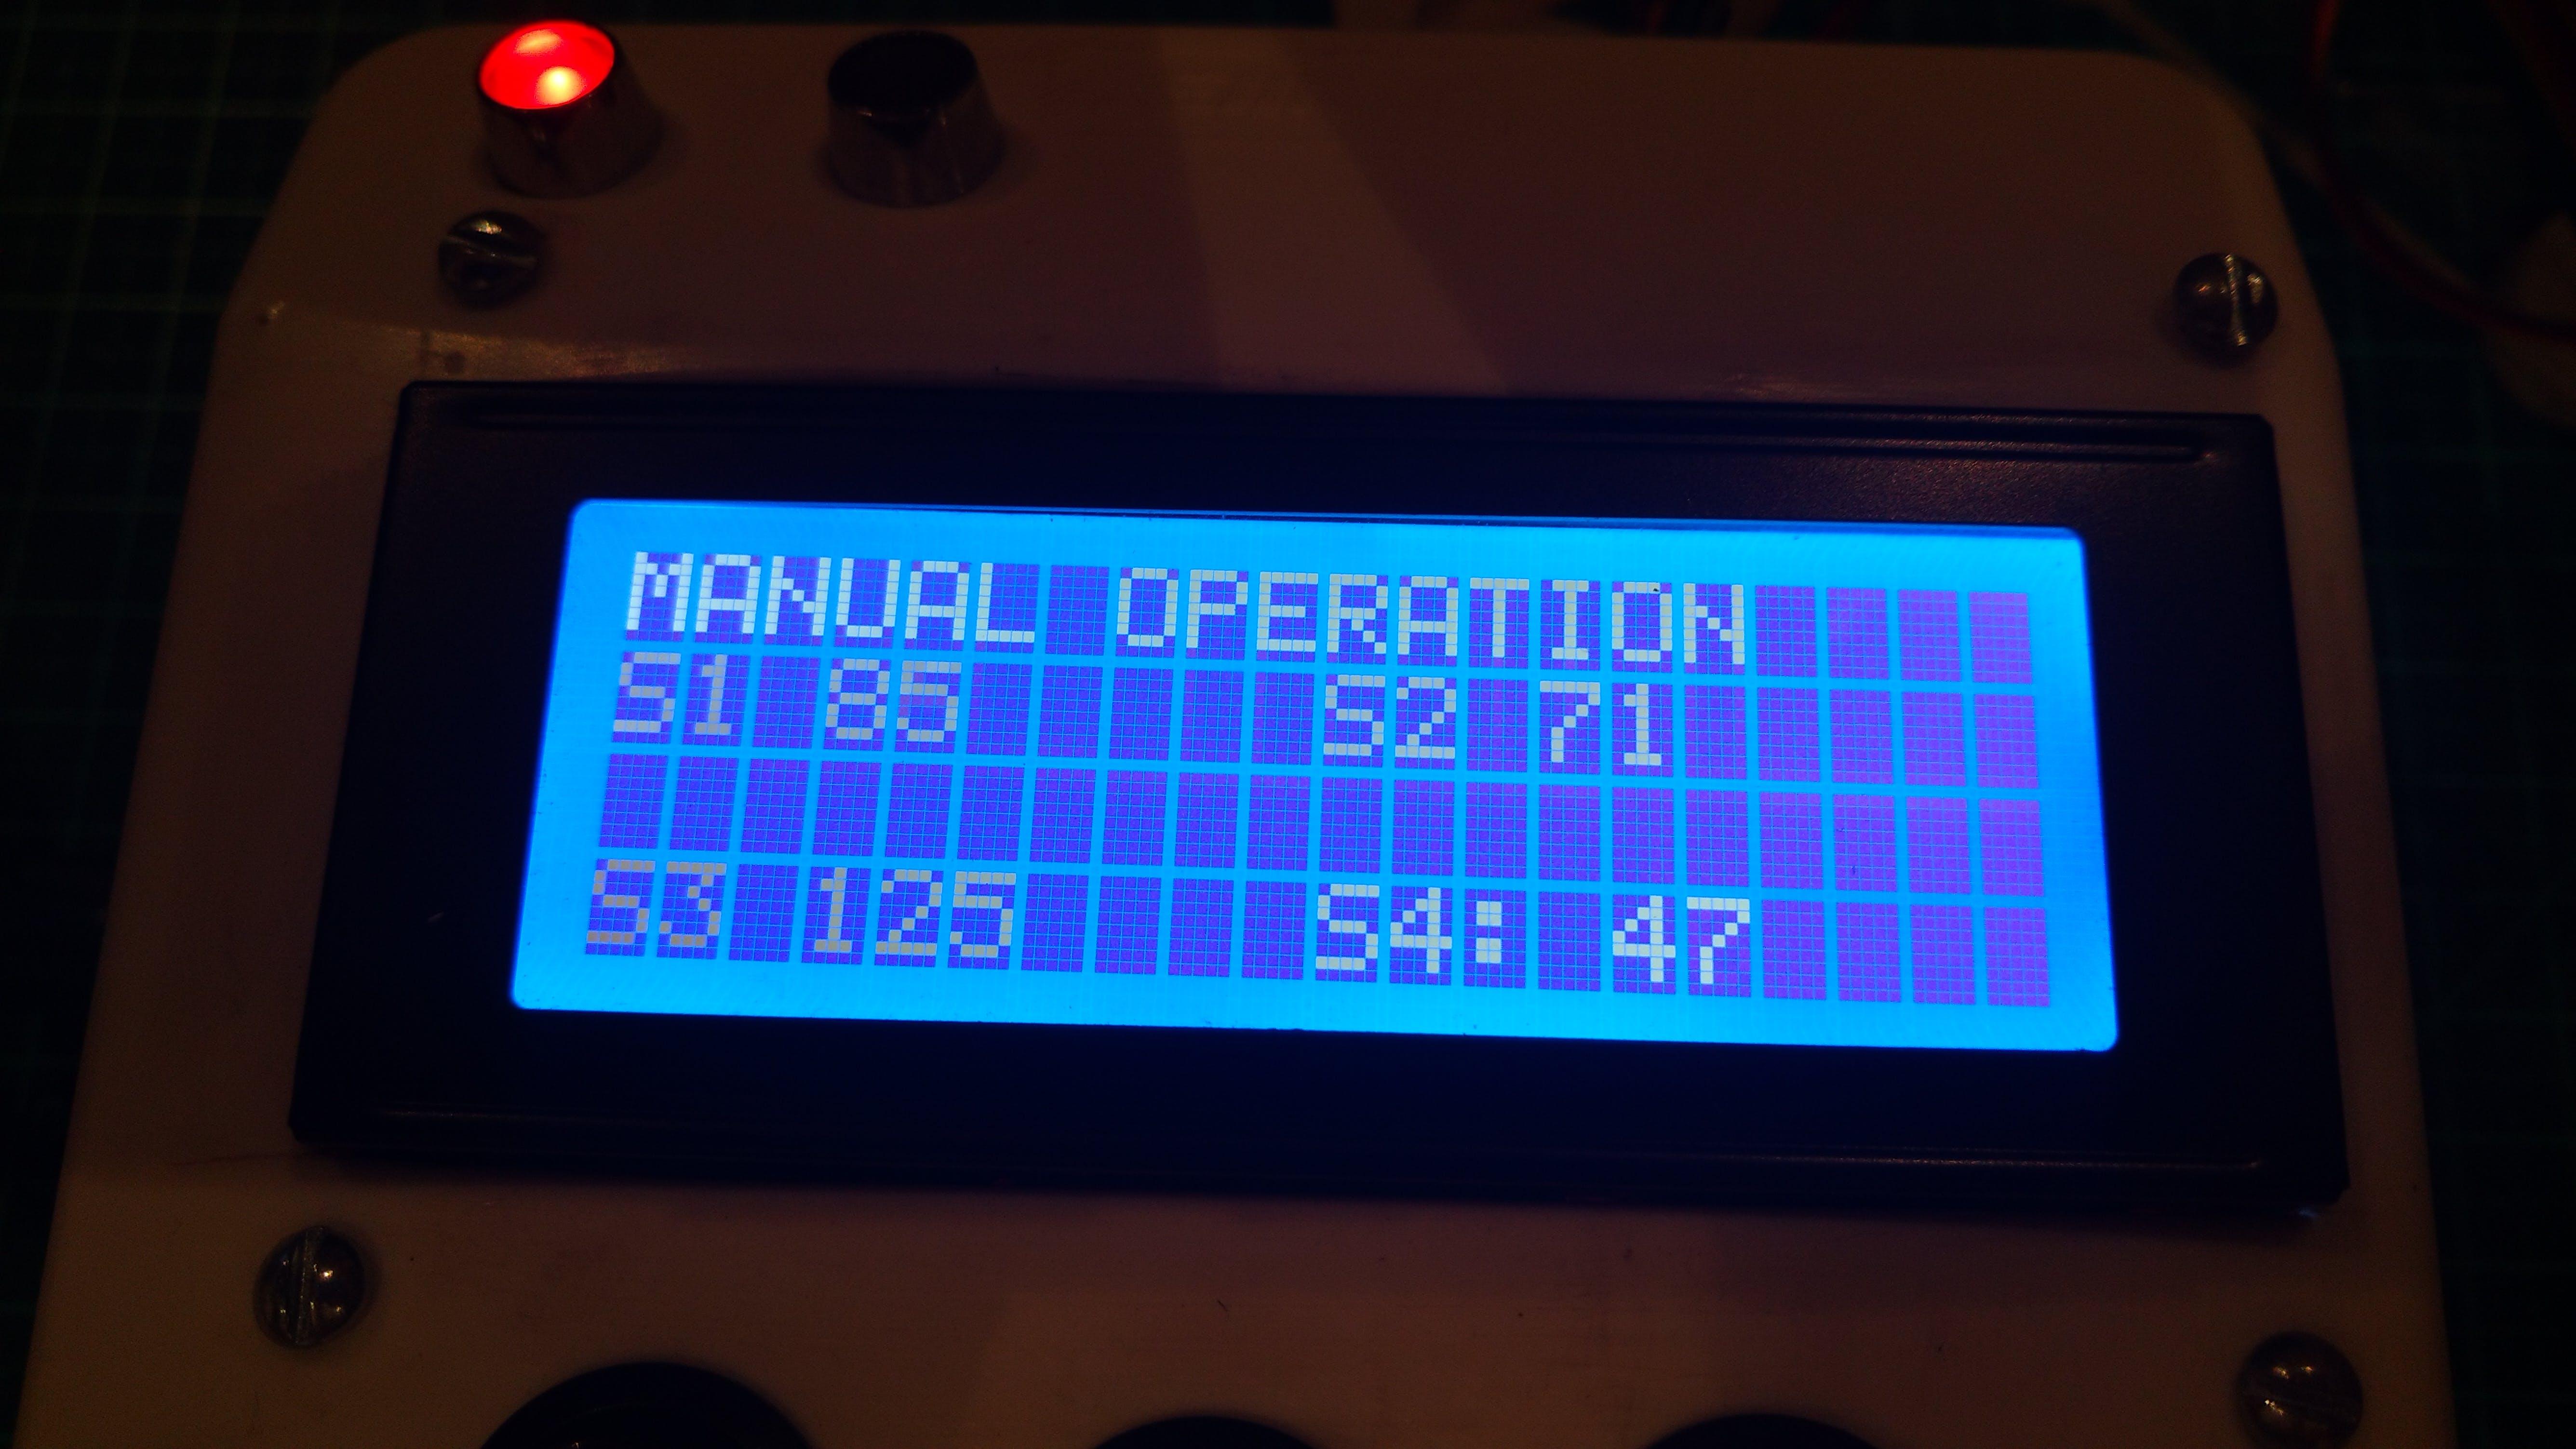 Manul Mode Screen